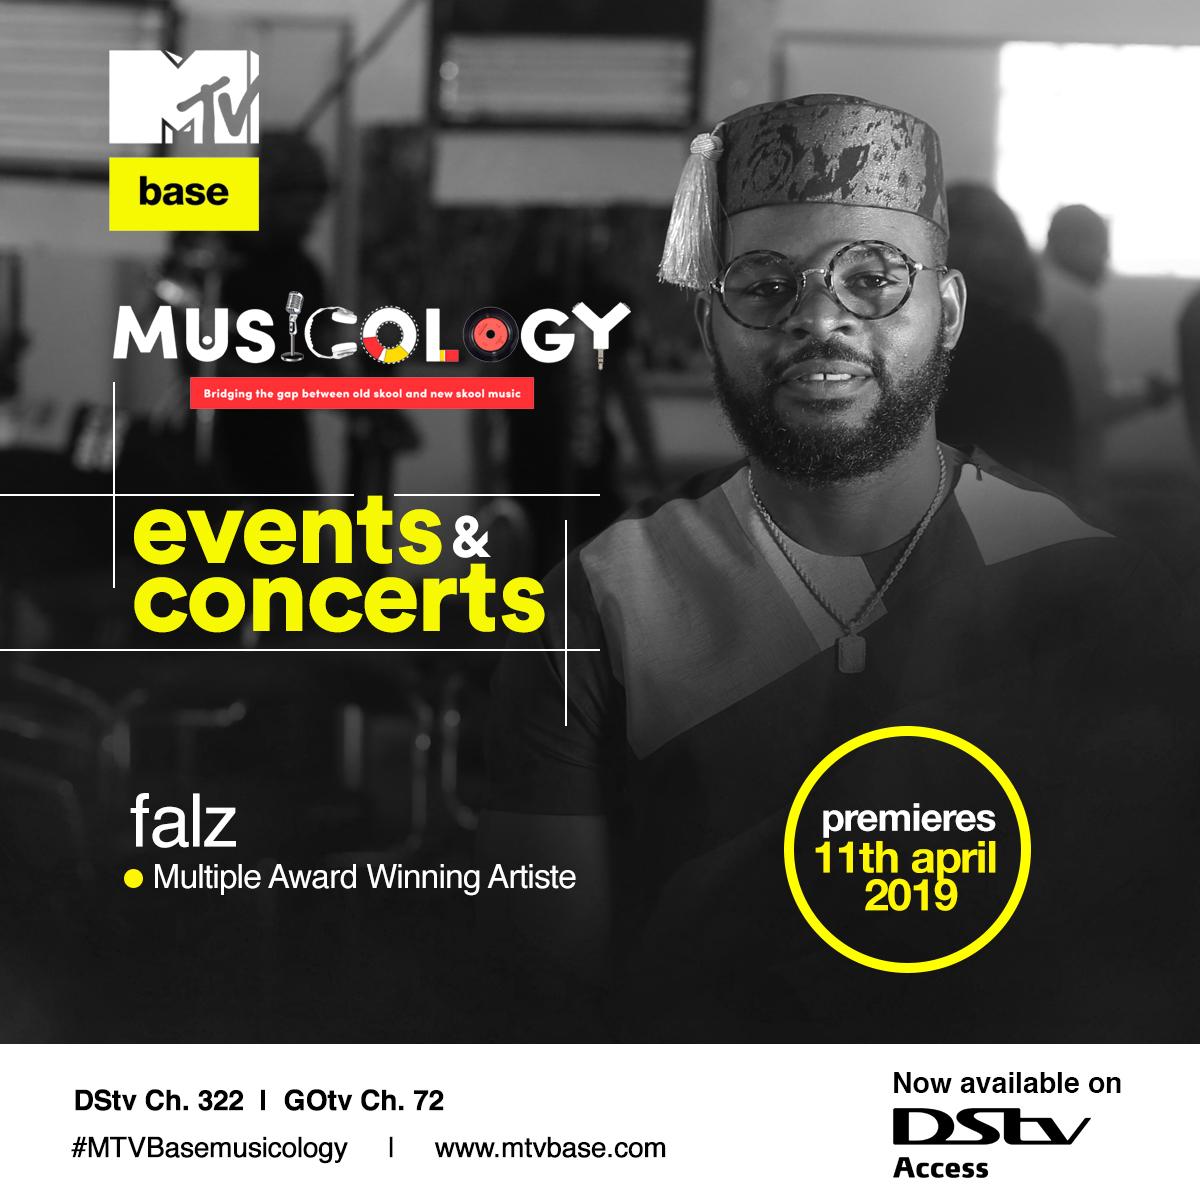 Falz, Olisa Adibua, Edi Lawani & more discuss Nigerian Events and Concerts on MTV Base's Musicology